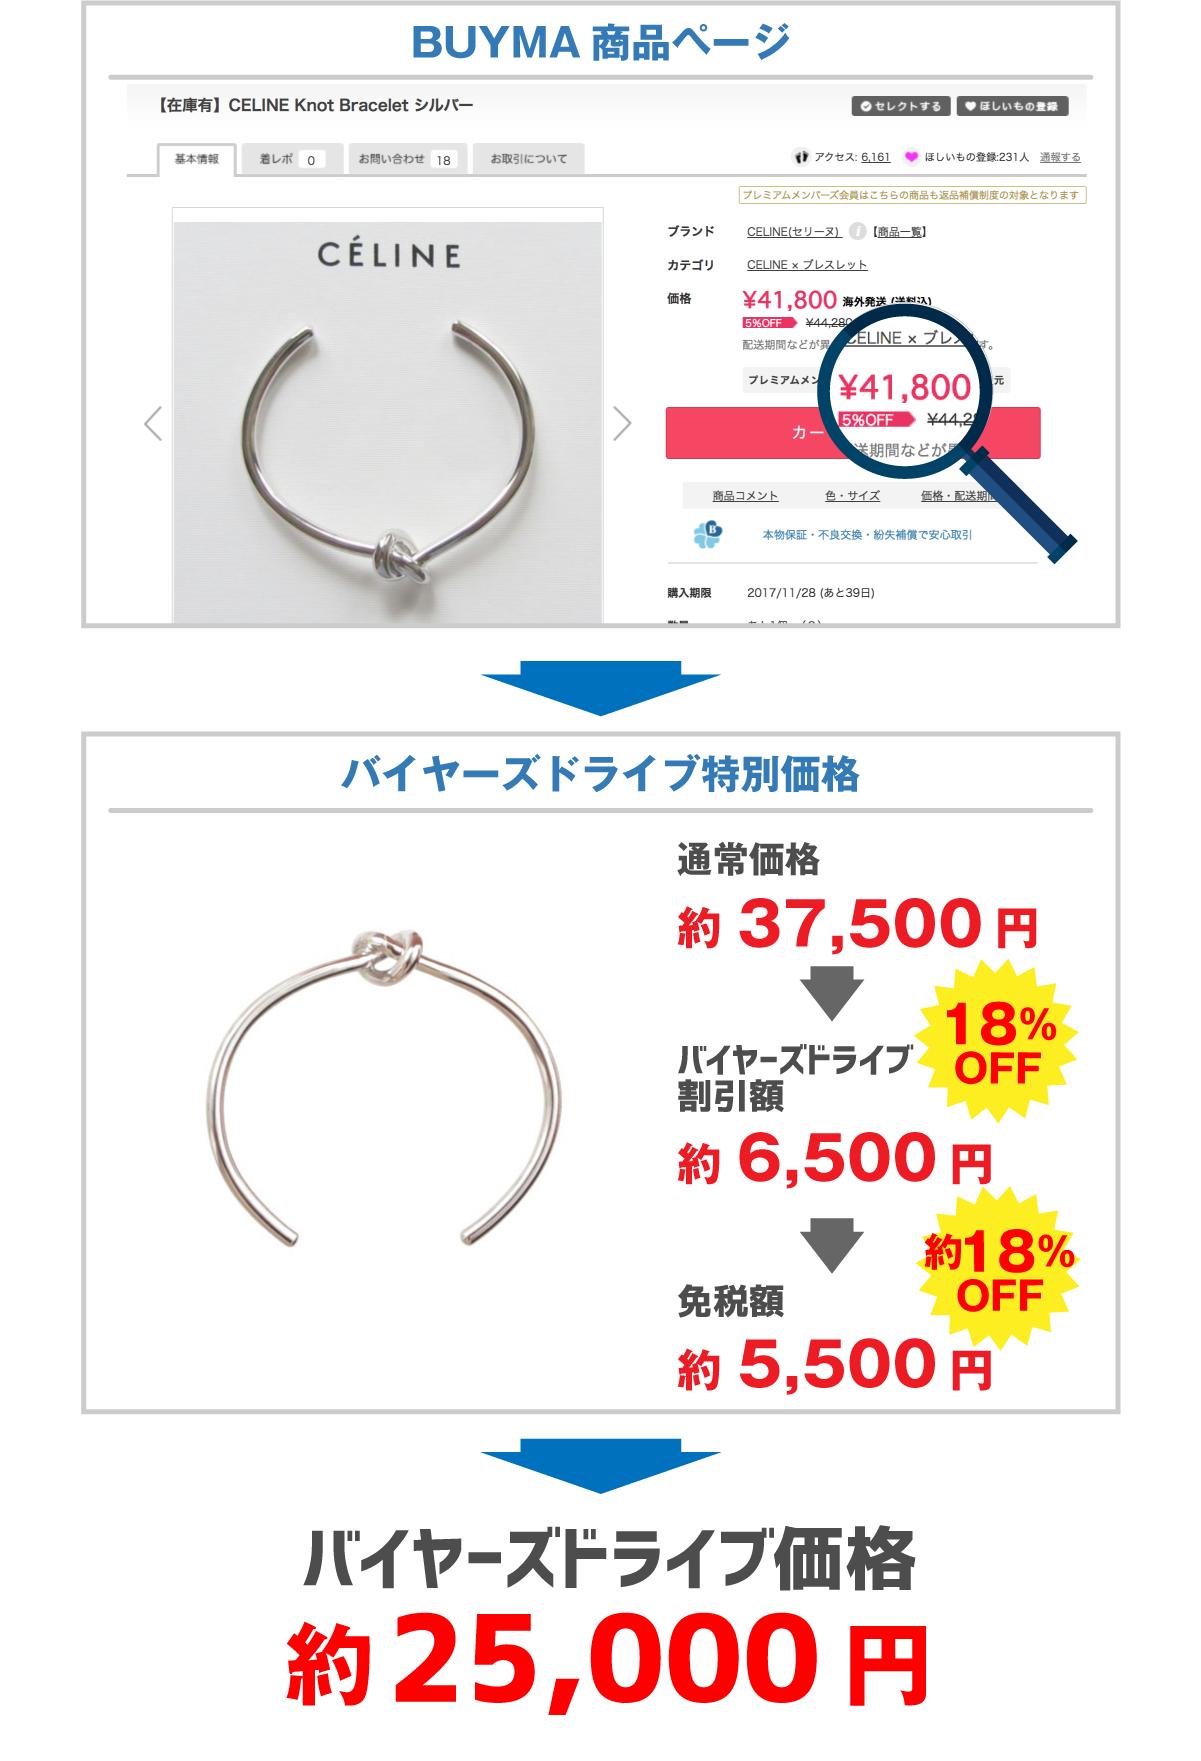 【CELINE】Knot ブレスレット